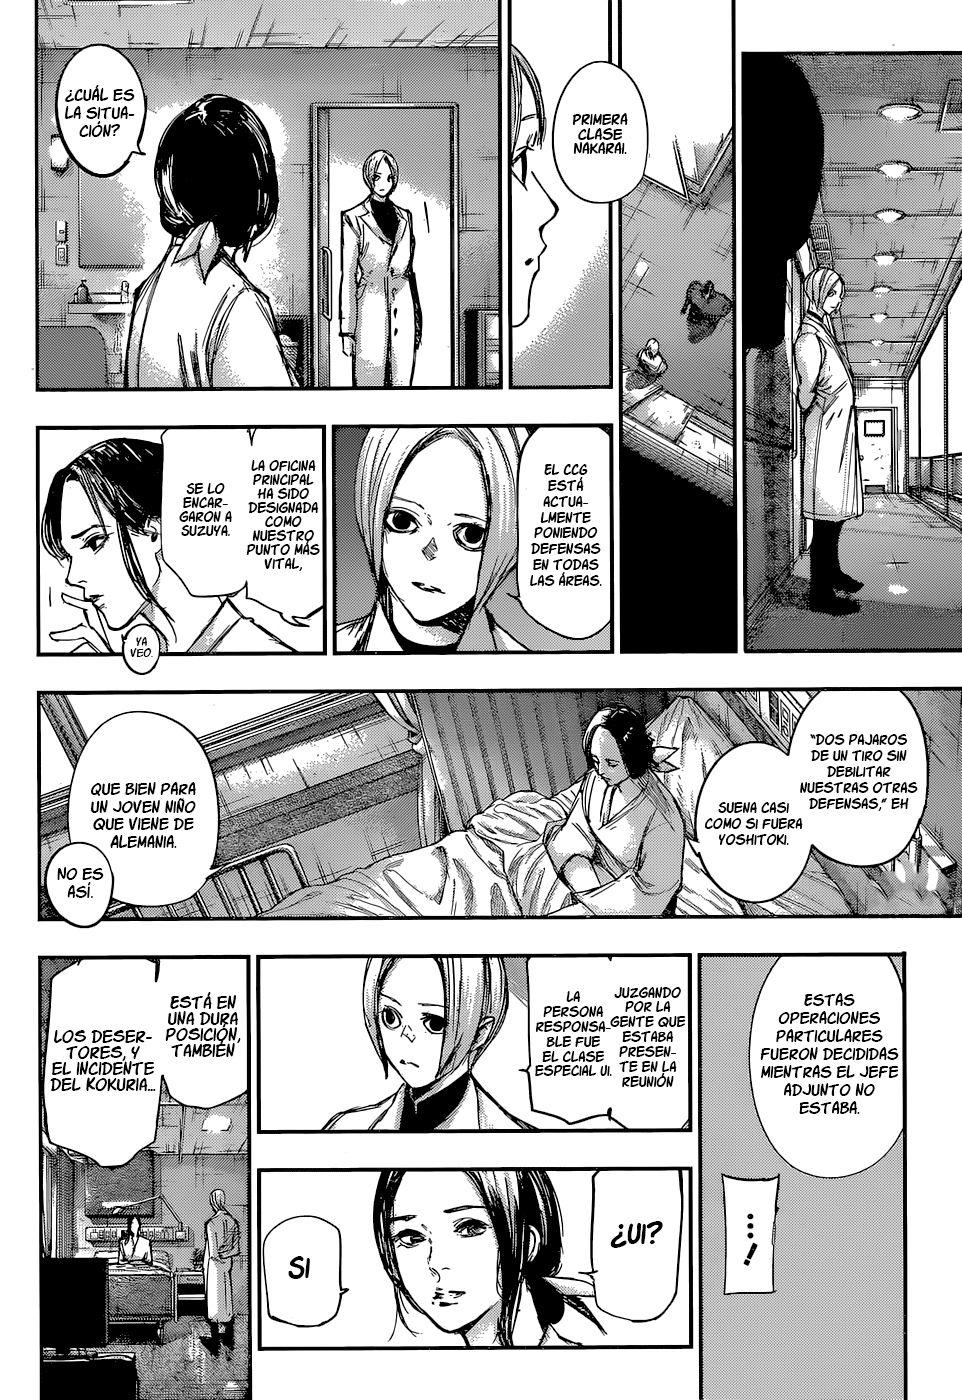 http://c5.ninemanga.com/es_manga/pic2/59/59/525294/93f04334d788c3a859389e0f7708f1eb.jpg Page 7